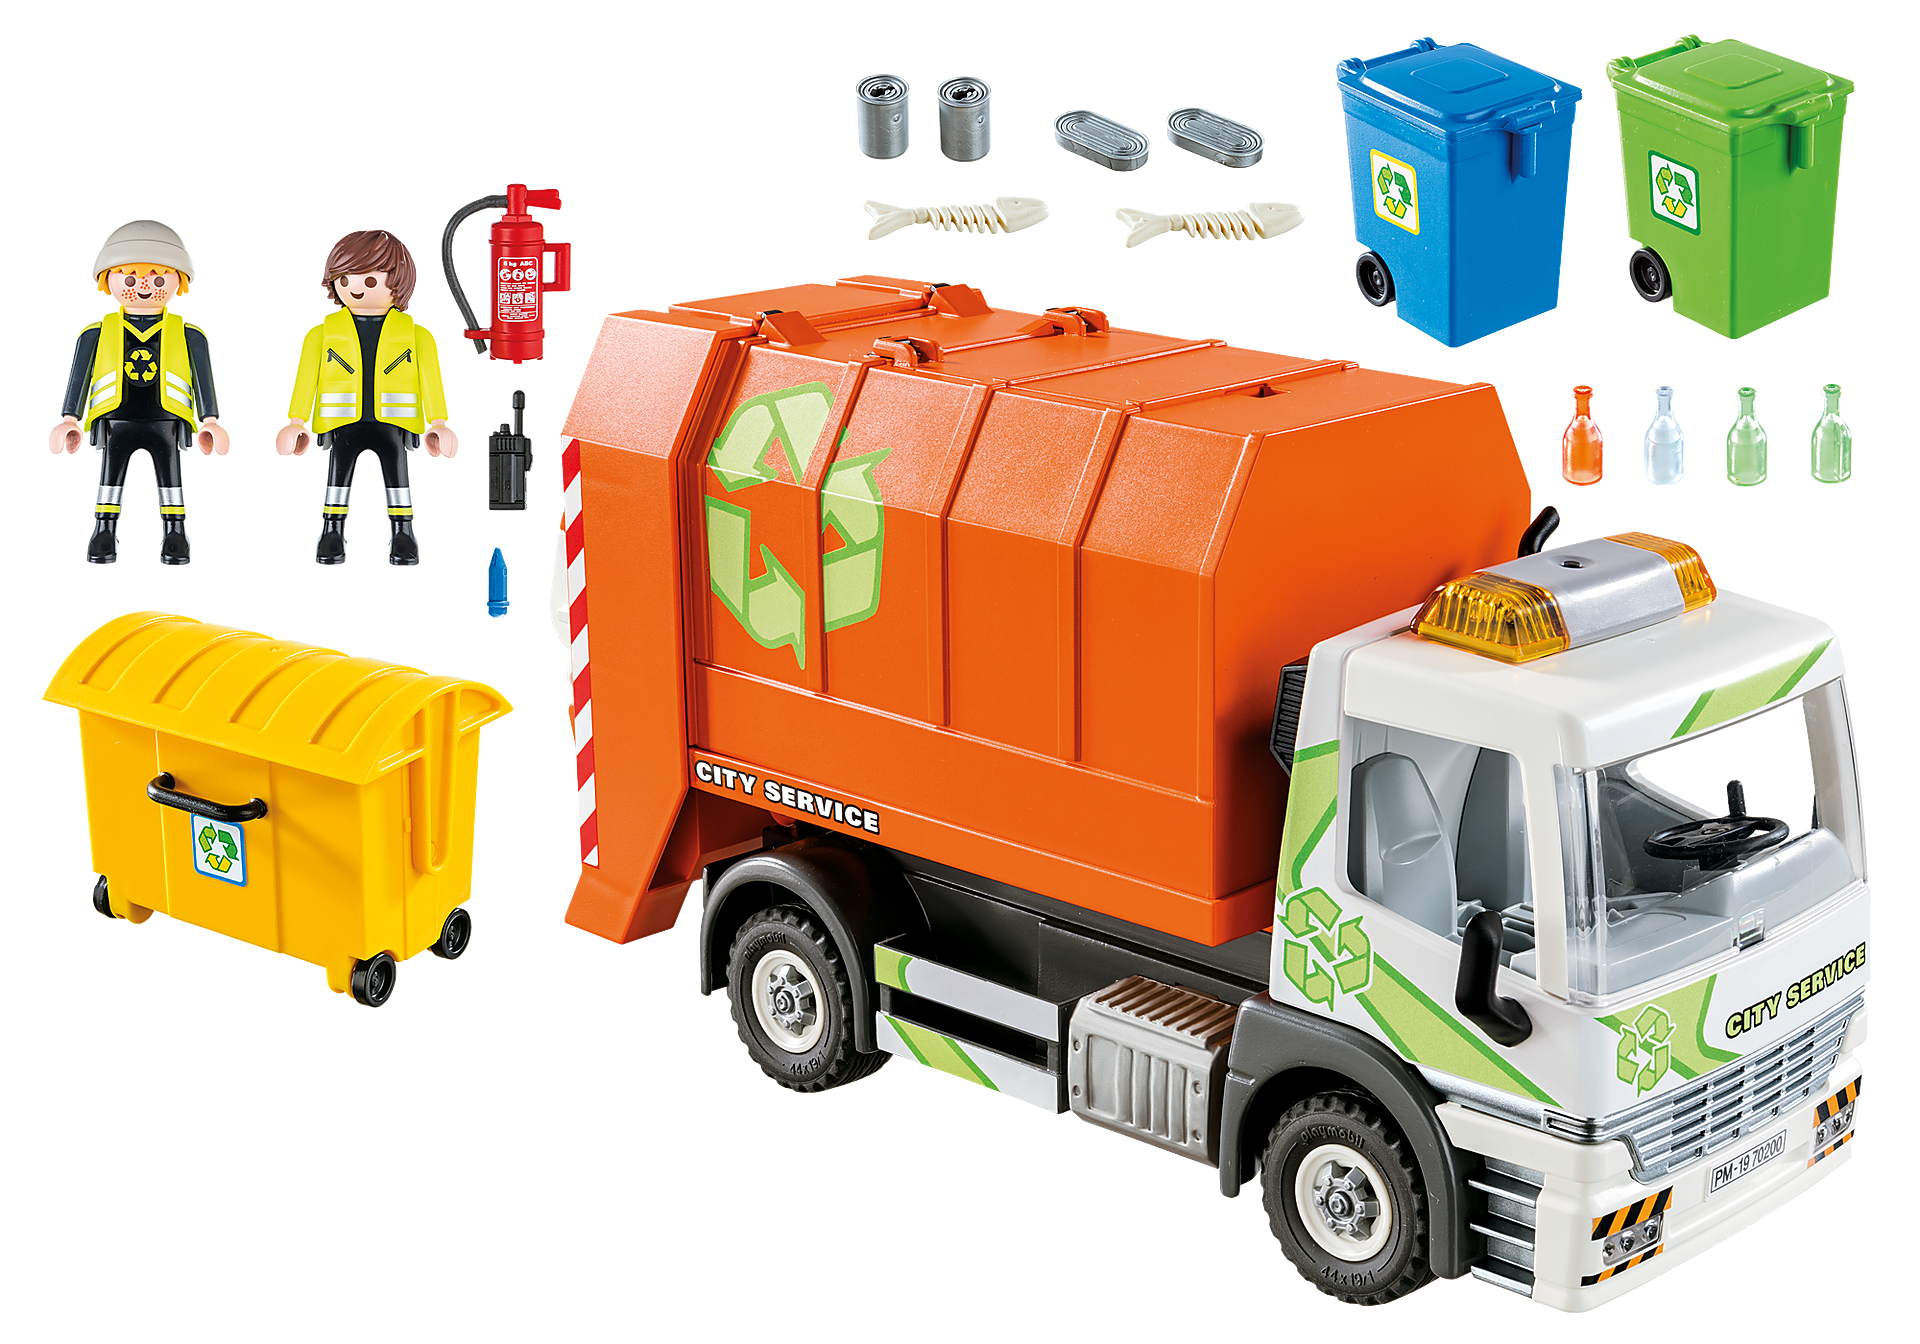 70200 Camion de recyclage des ordures zoom image3